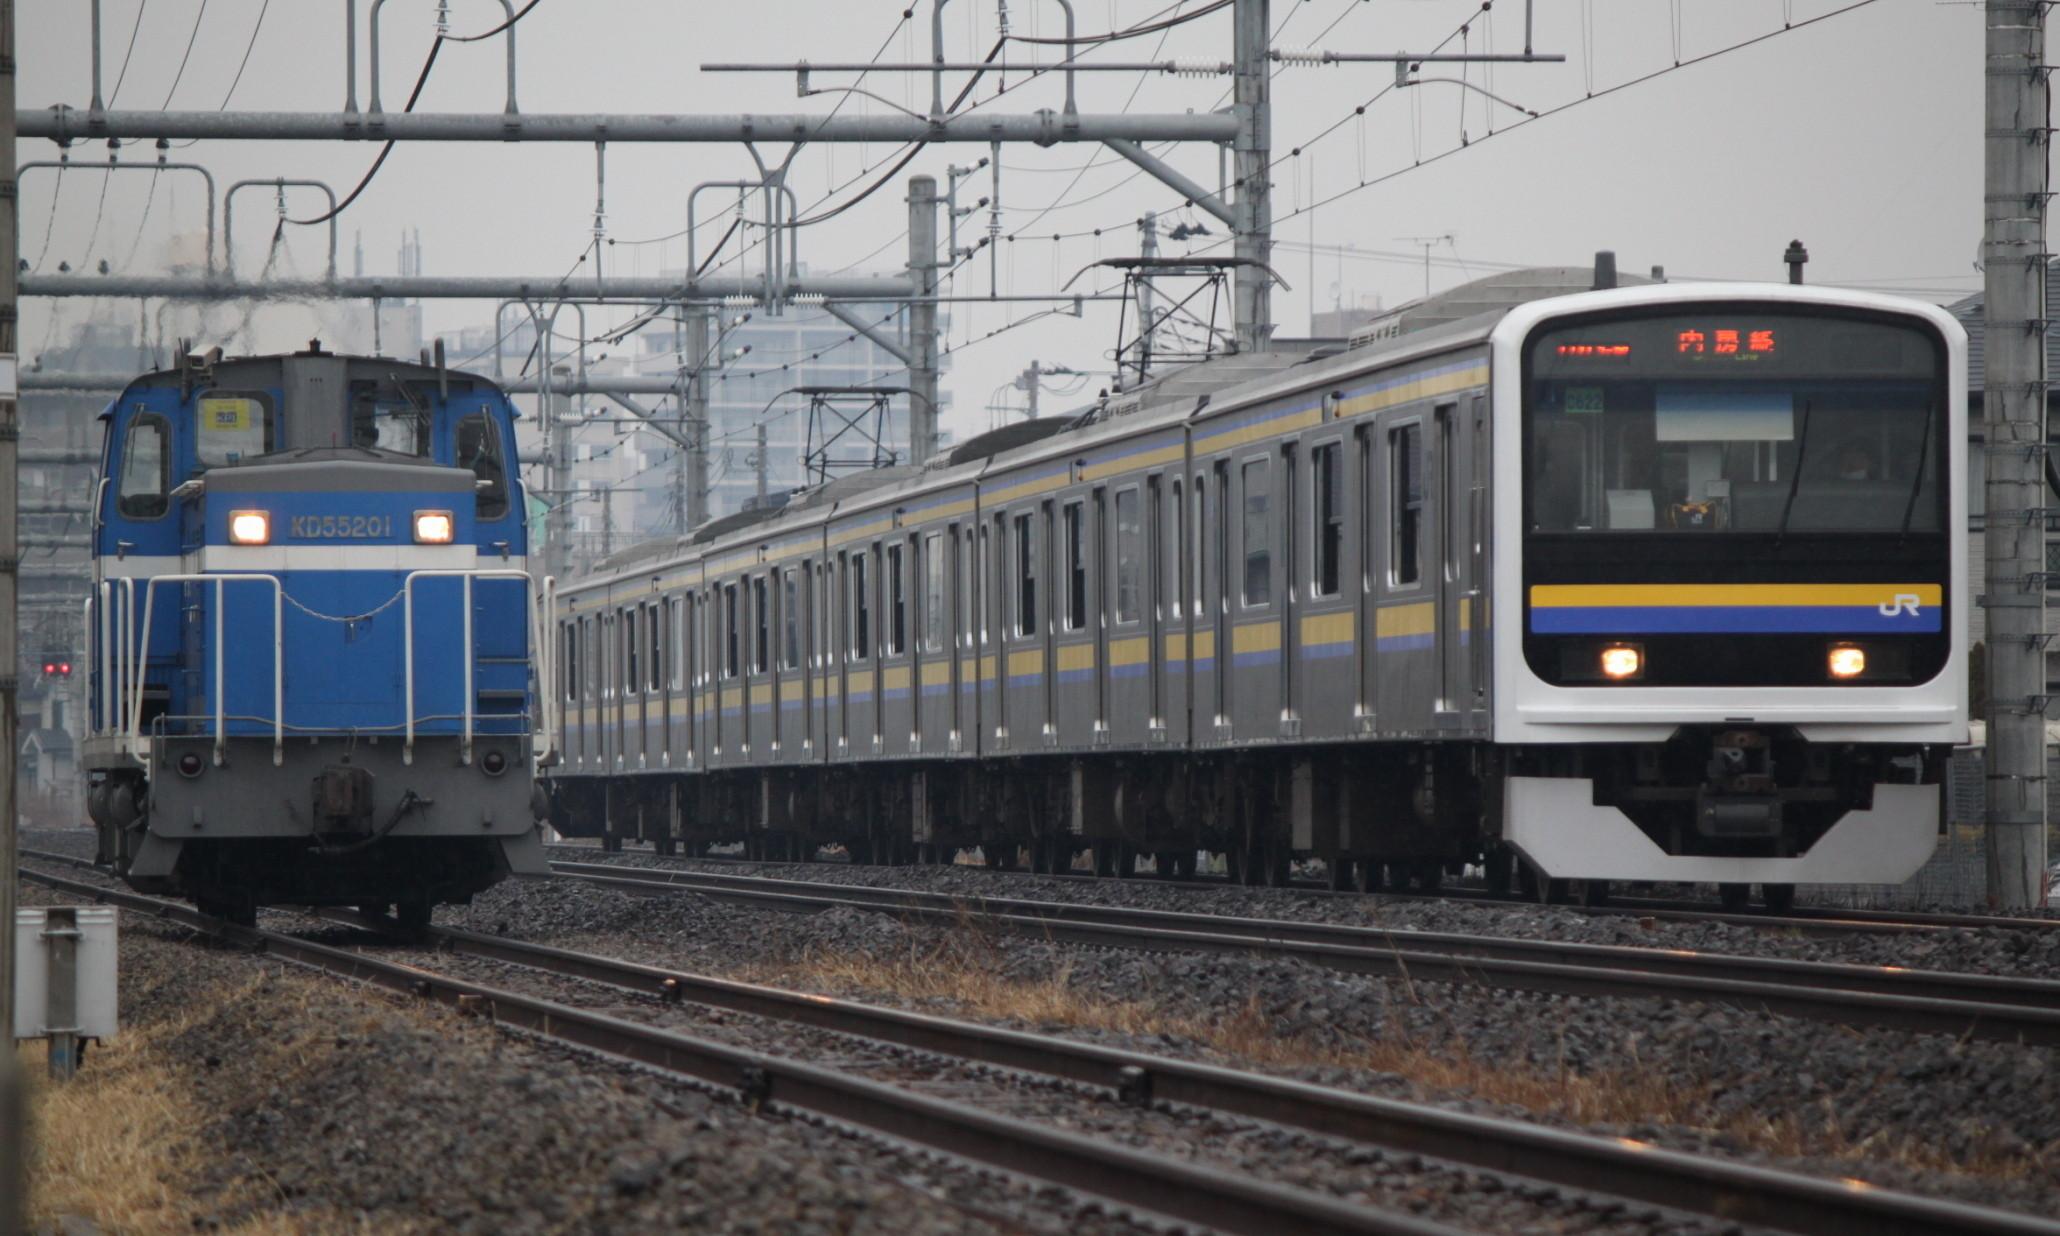 Keiyo_Rinkai_Railway_KD55_201_with_JR_East_Uchibo_Line